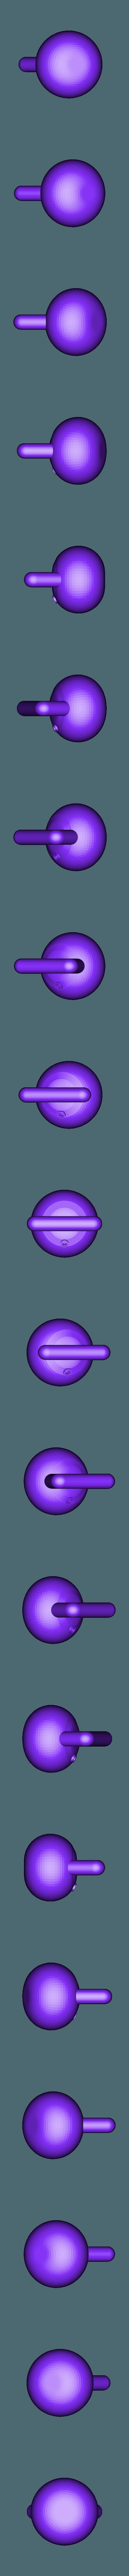 pesa griega.STL Download free STL file kettlebell or russian weight / pesa rusa • 3D printing object, allv